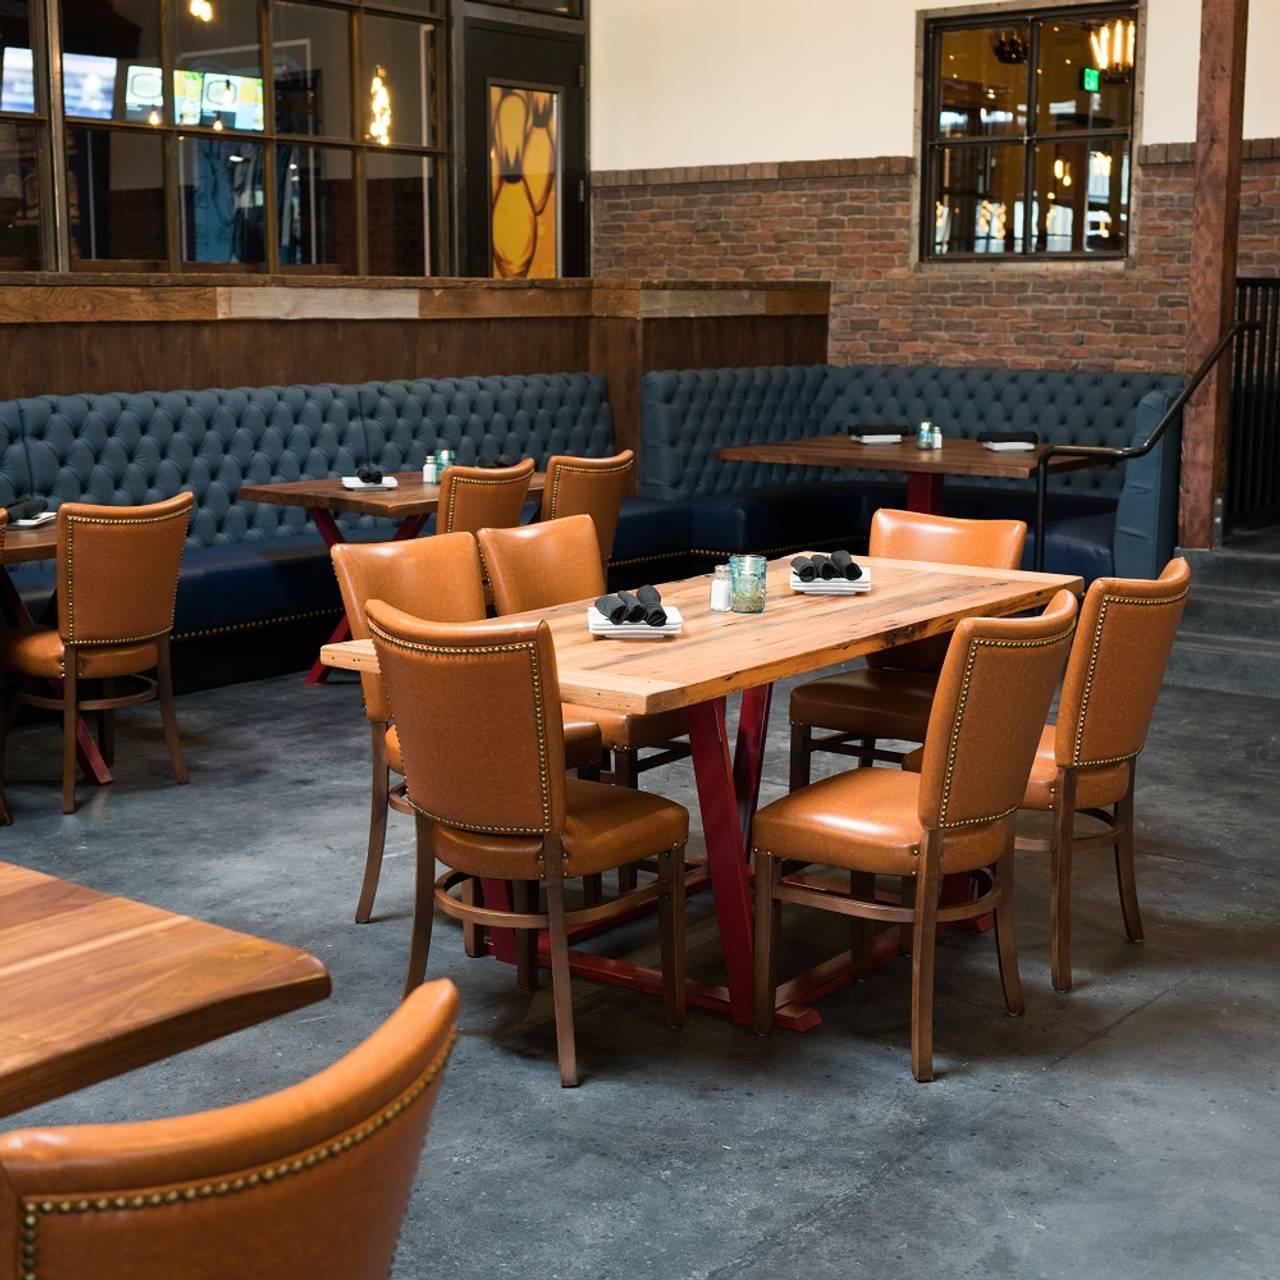 Urge Gastropub & Common House Restaurant - San Marcos, CA | OpenTable